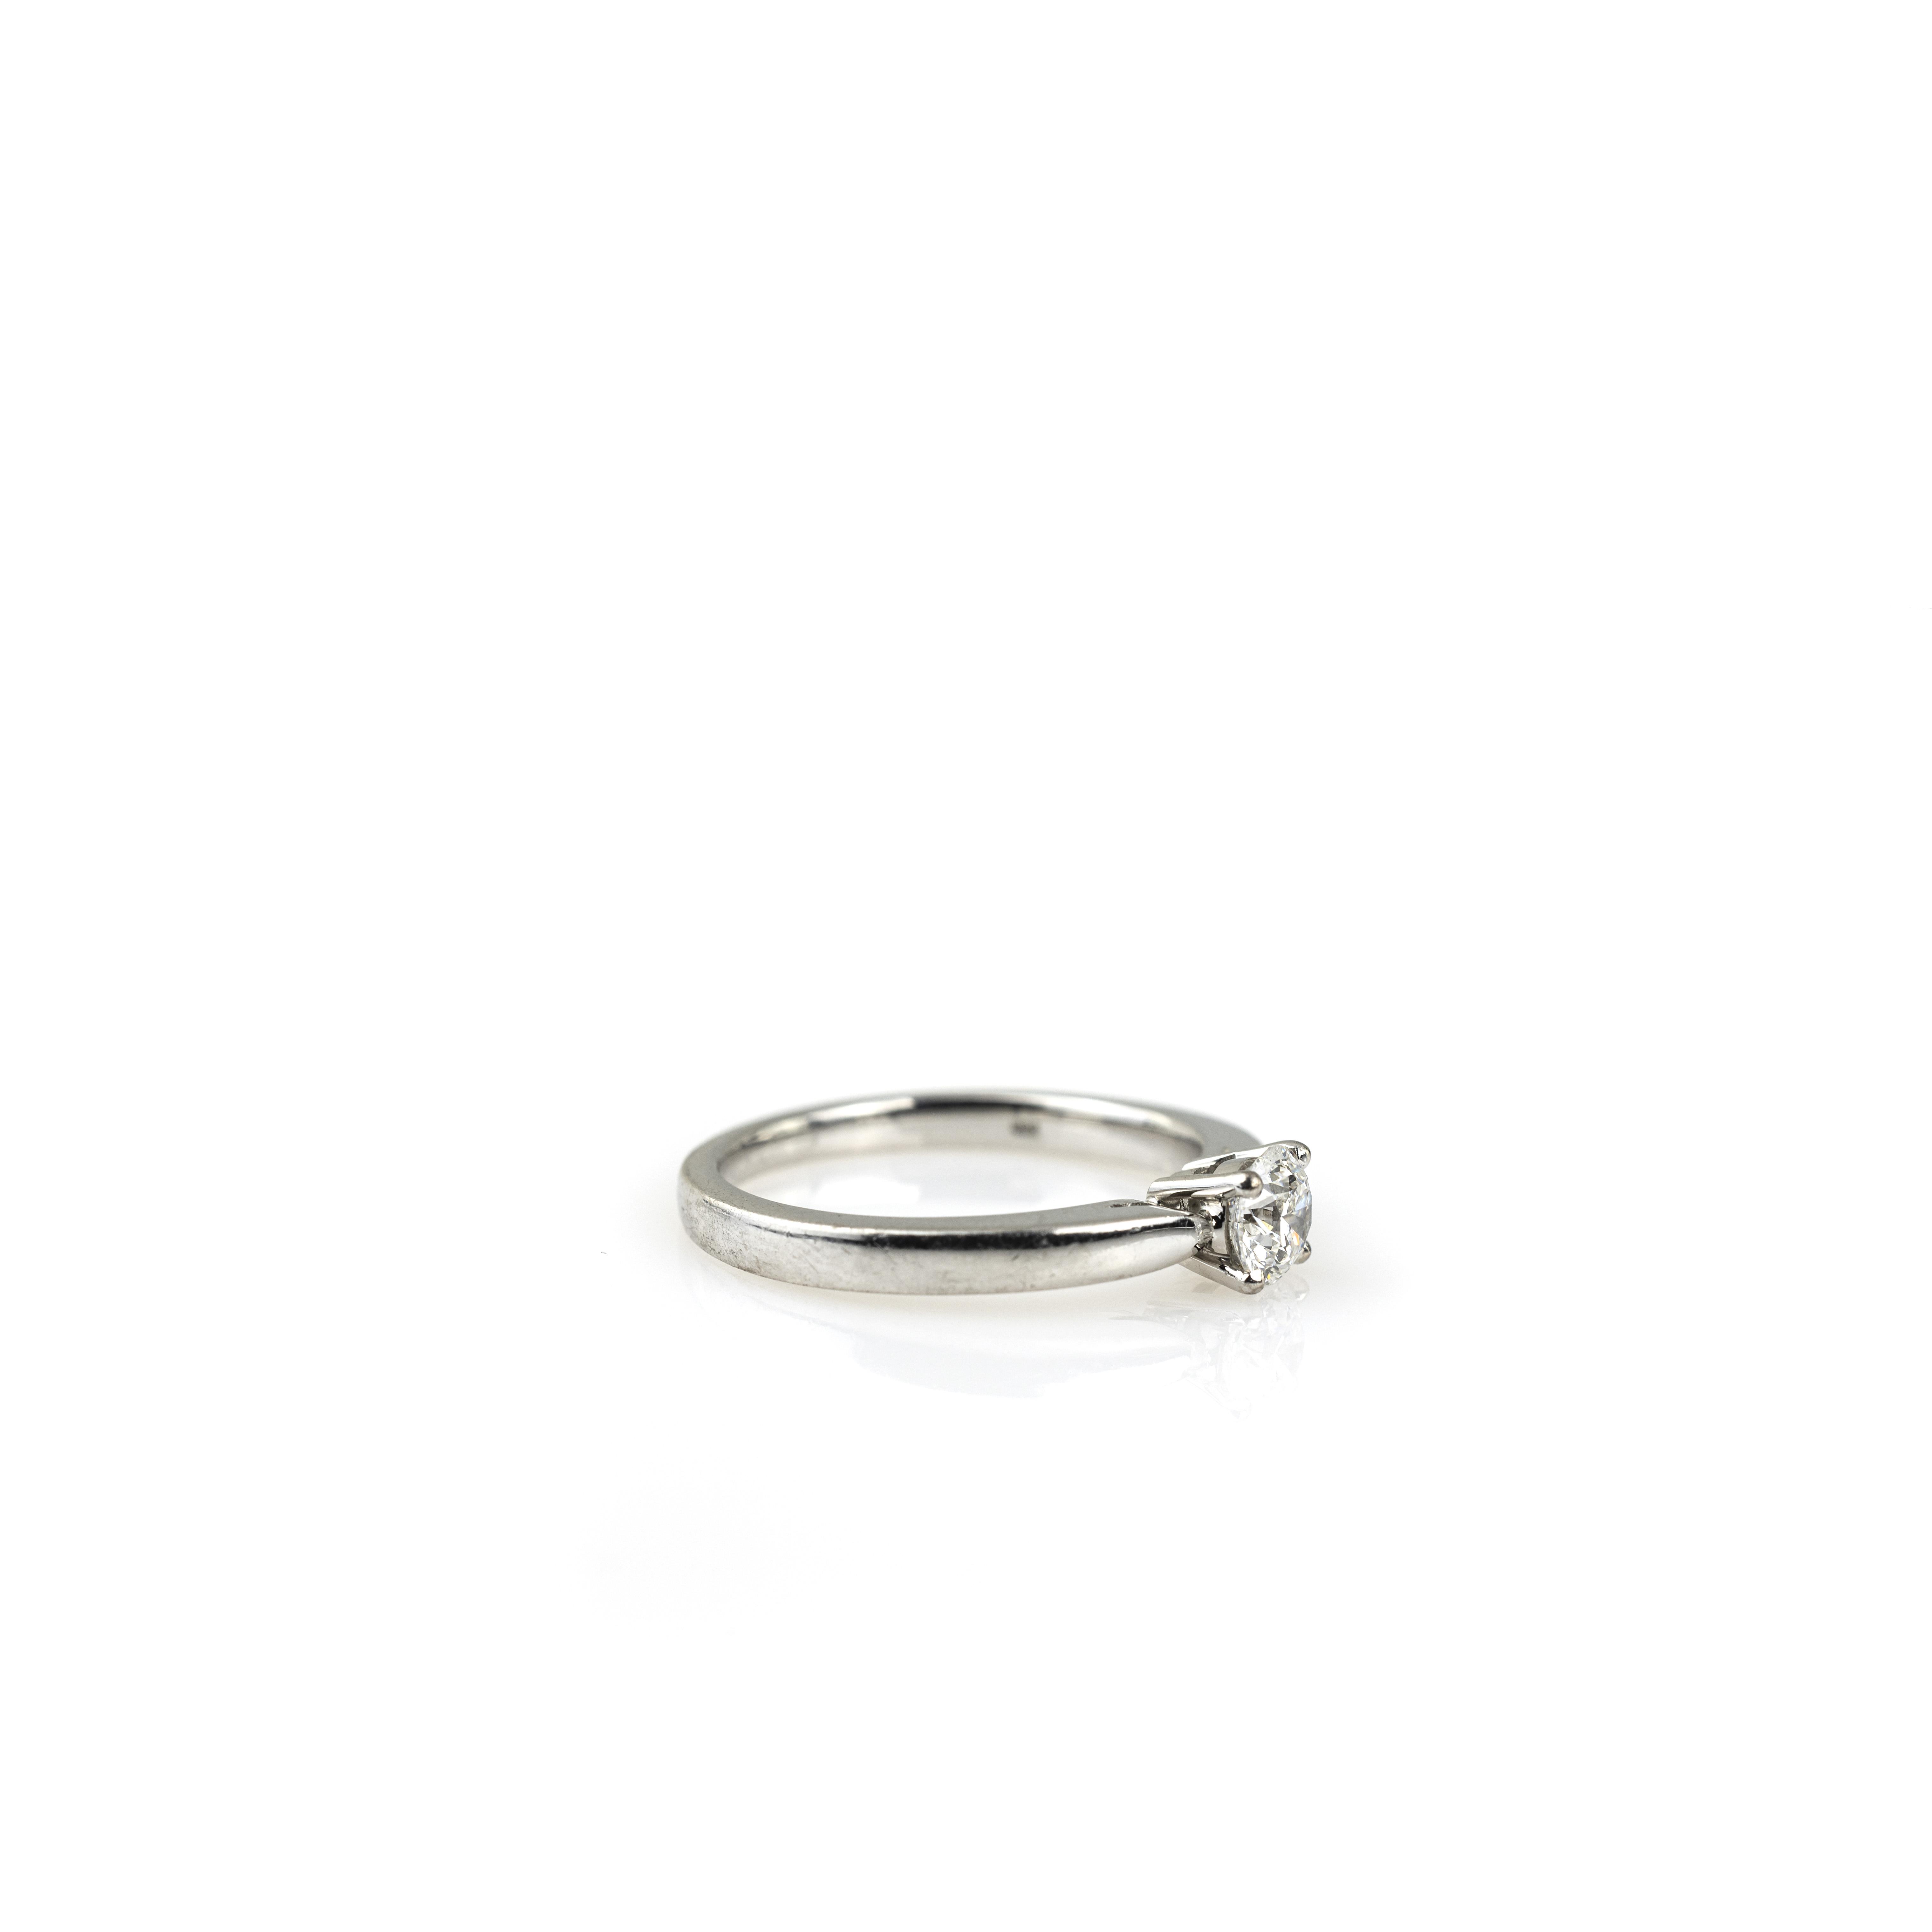 Solitair-Ring - Image 2 of 2